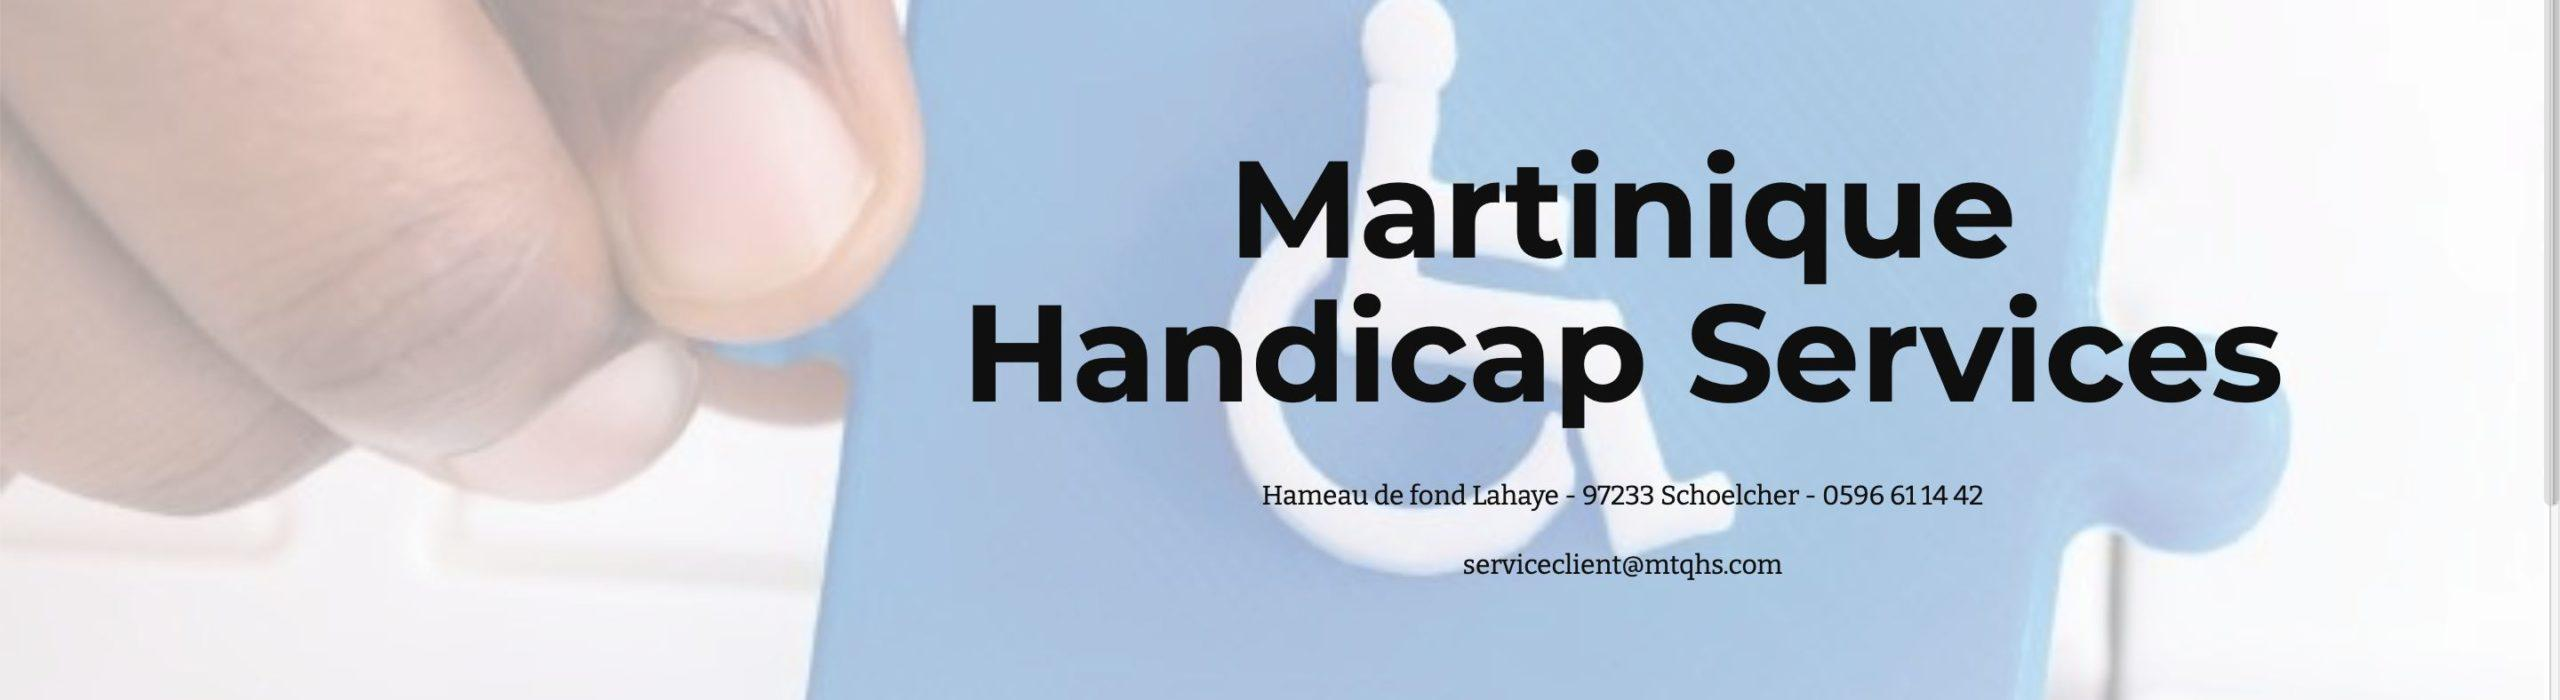 Martinique Handicap Services-MHS